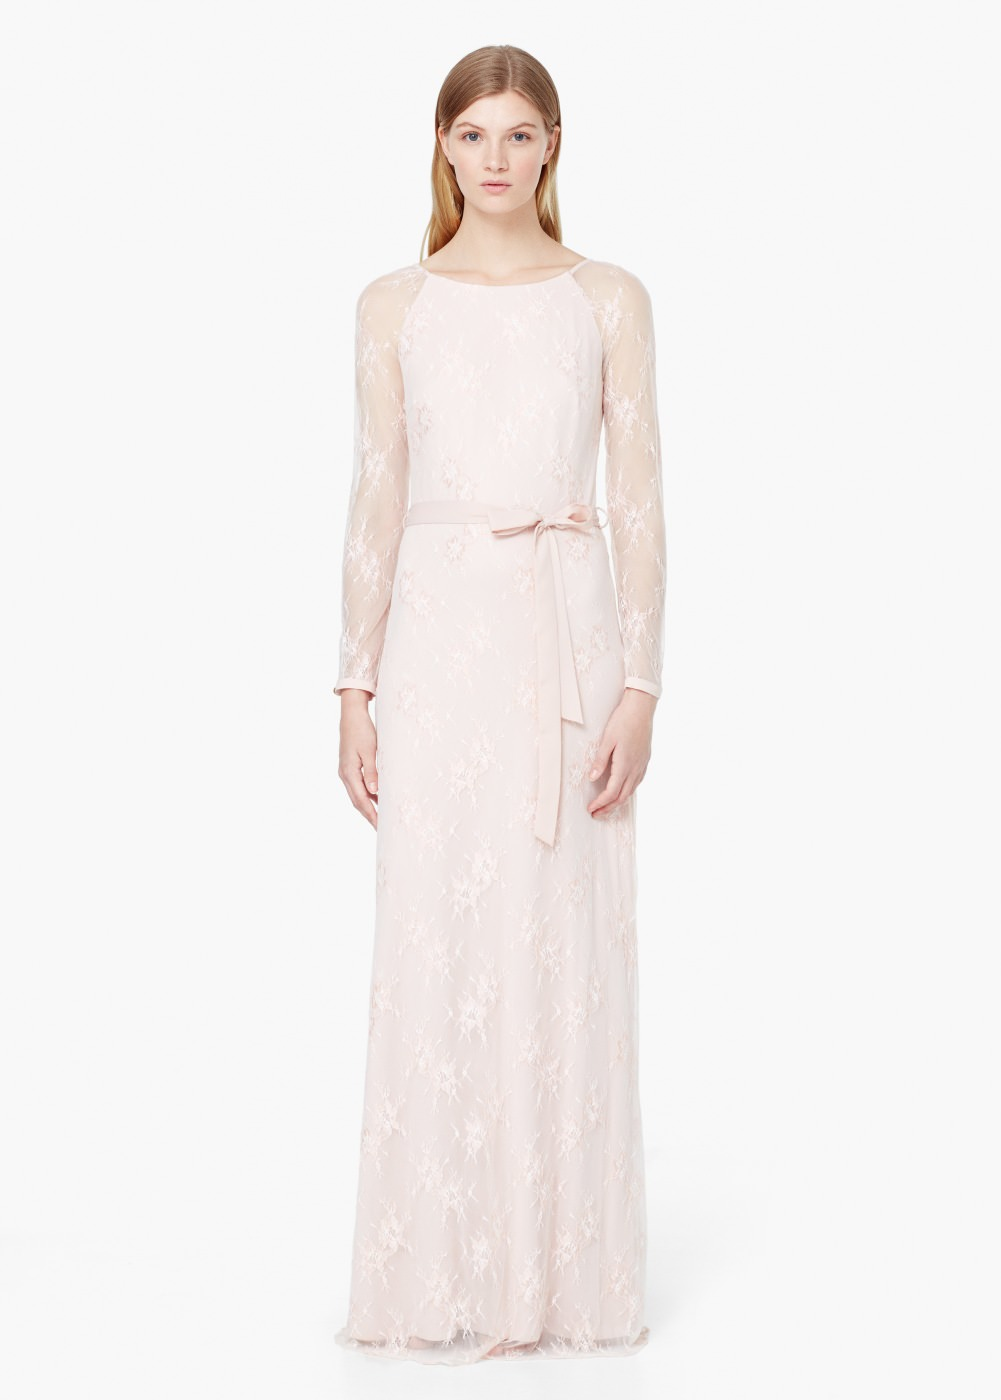 a3813304480c Μπορώ να φορέσω λευκό φόρεμα αντί για νυφικό στο γάμο μου  - Queen.gr